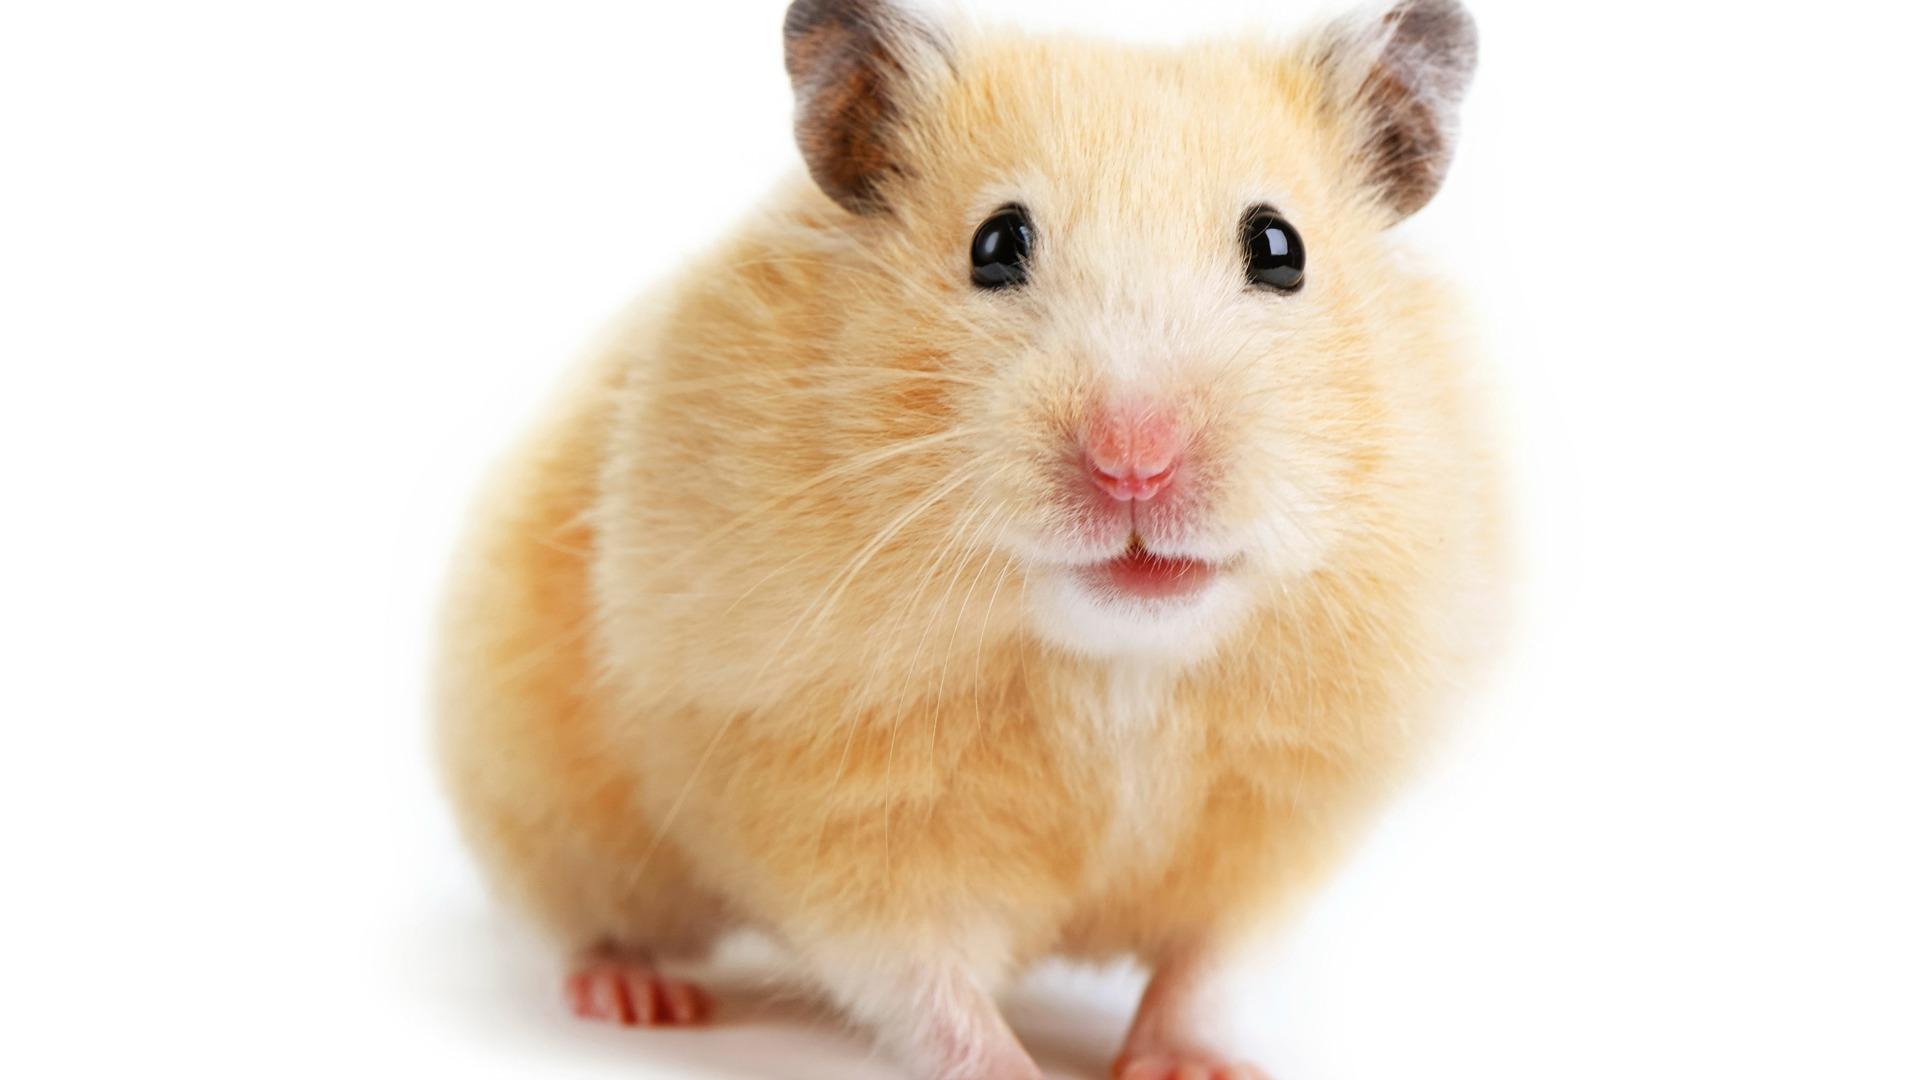 Hamster Images